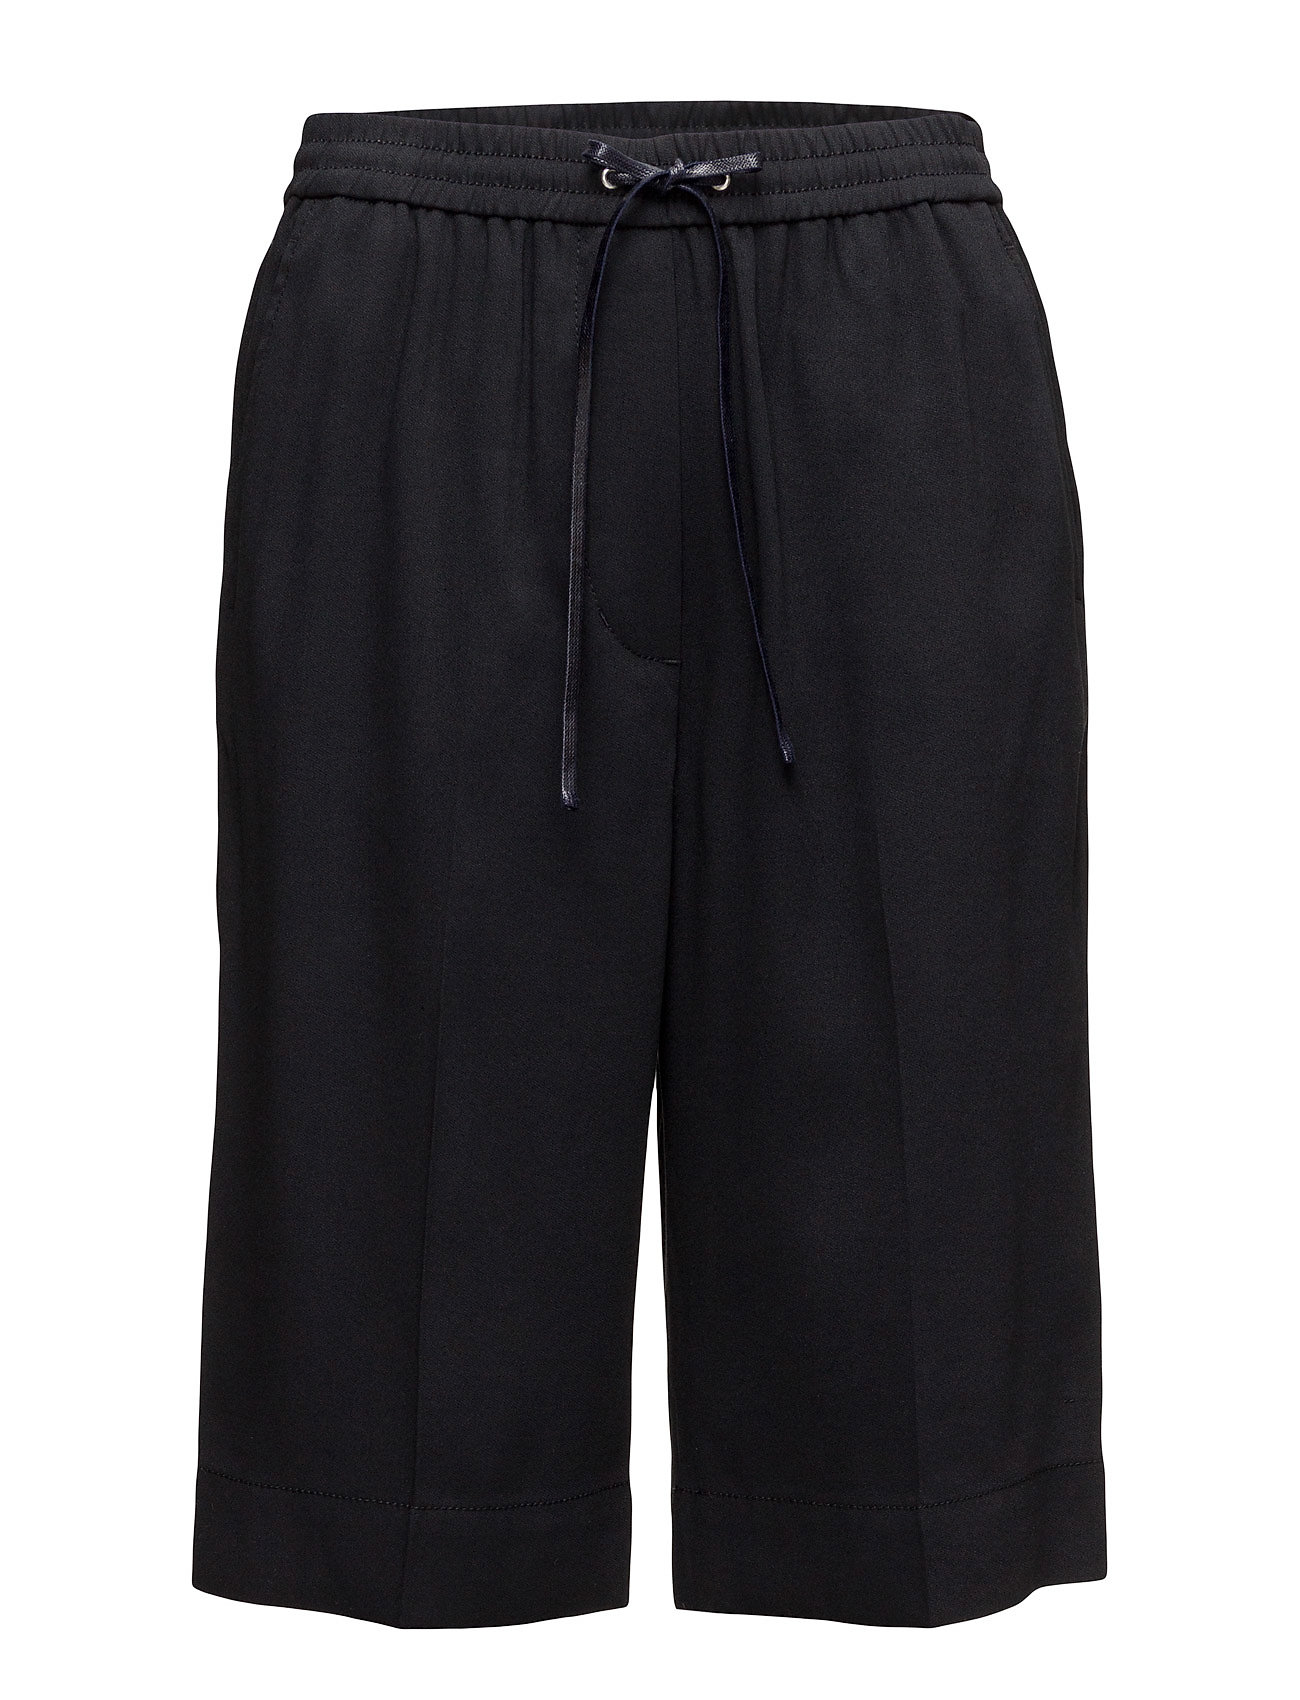 Bermuda Shorts-Crepe 3.1 Phillip Lim  til Damer i Midnight blå